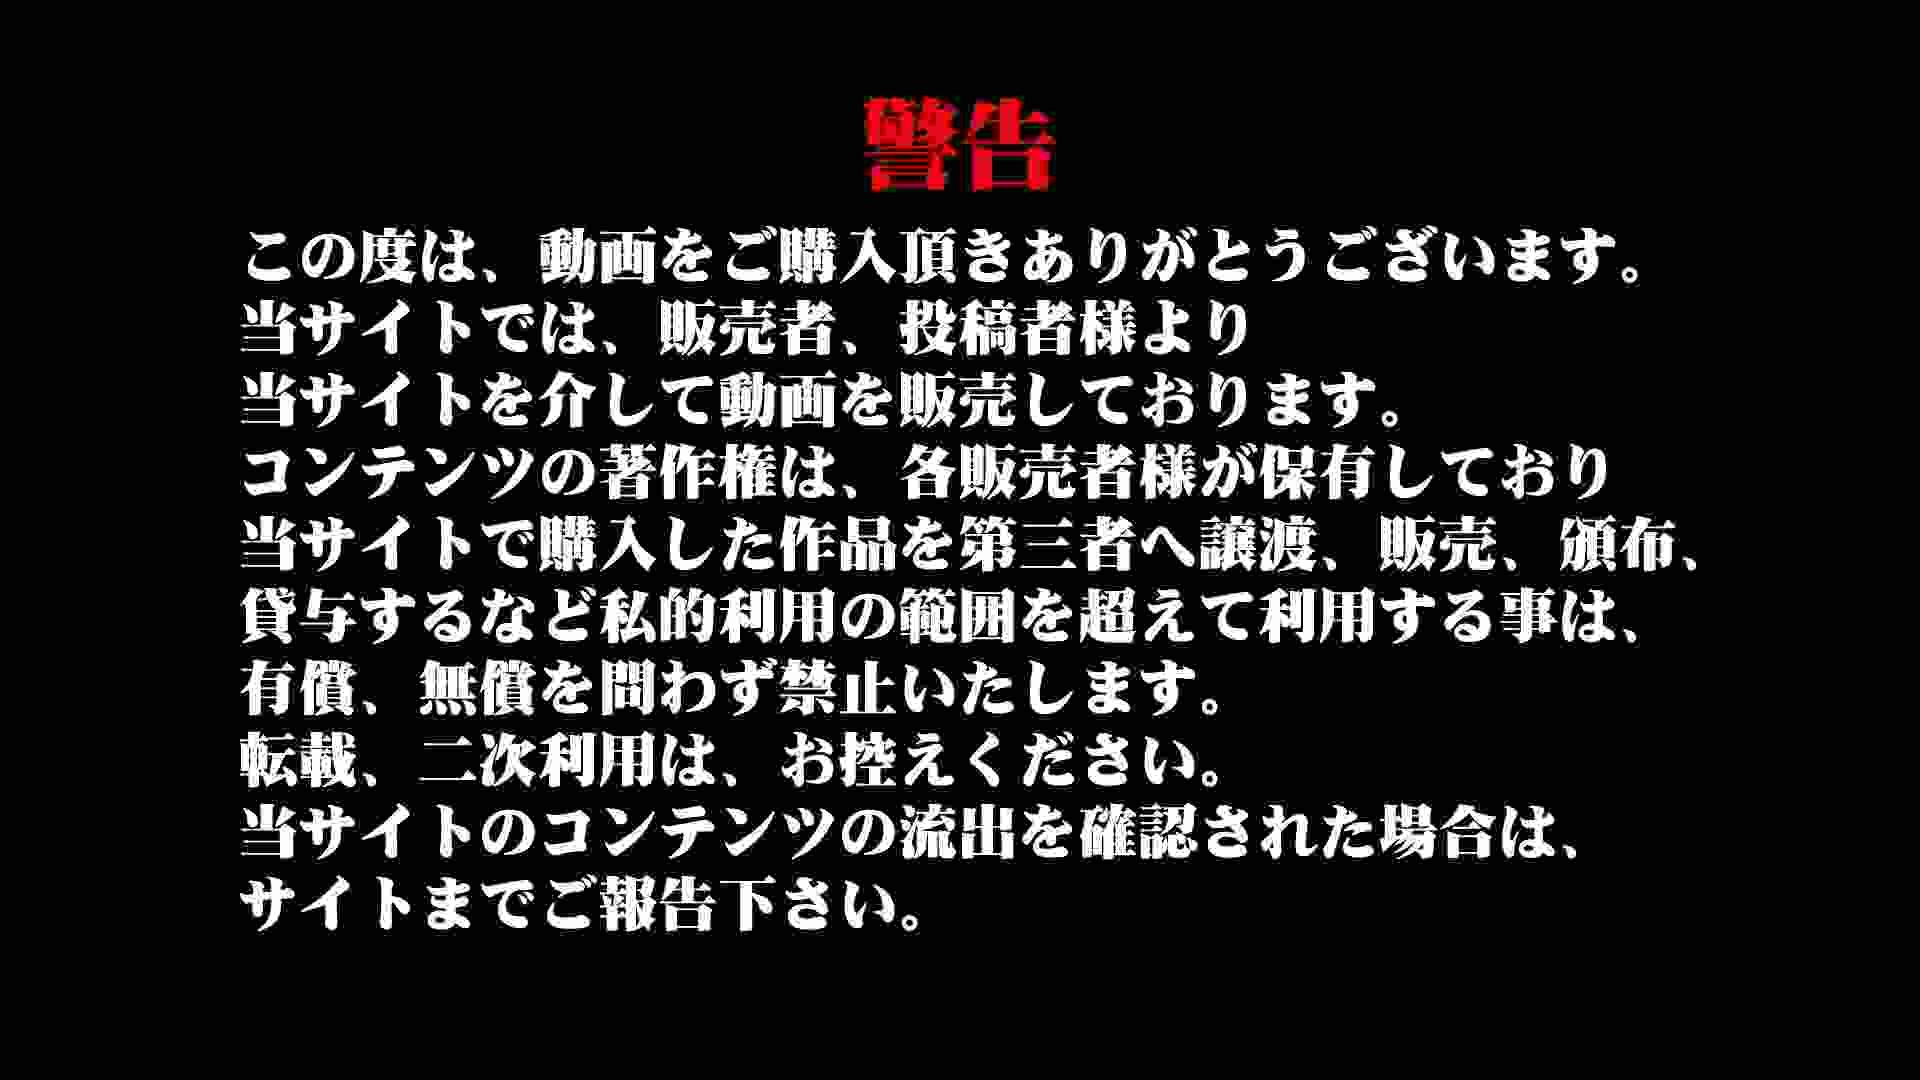 Aquaな露天風呂Vol.924 OLのエロ生活 オメコ動画キャプチャ 62連発 2